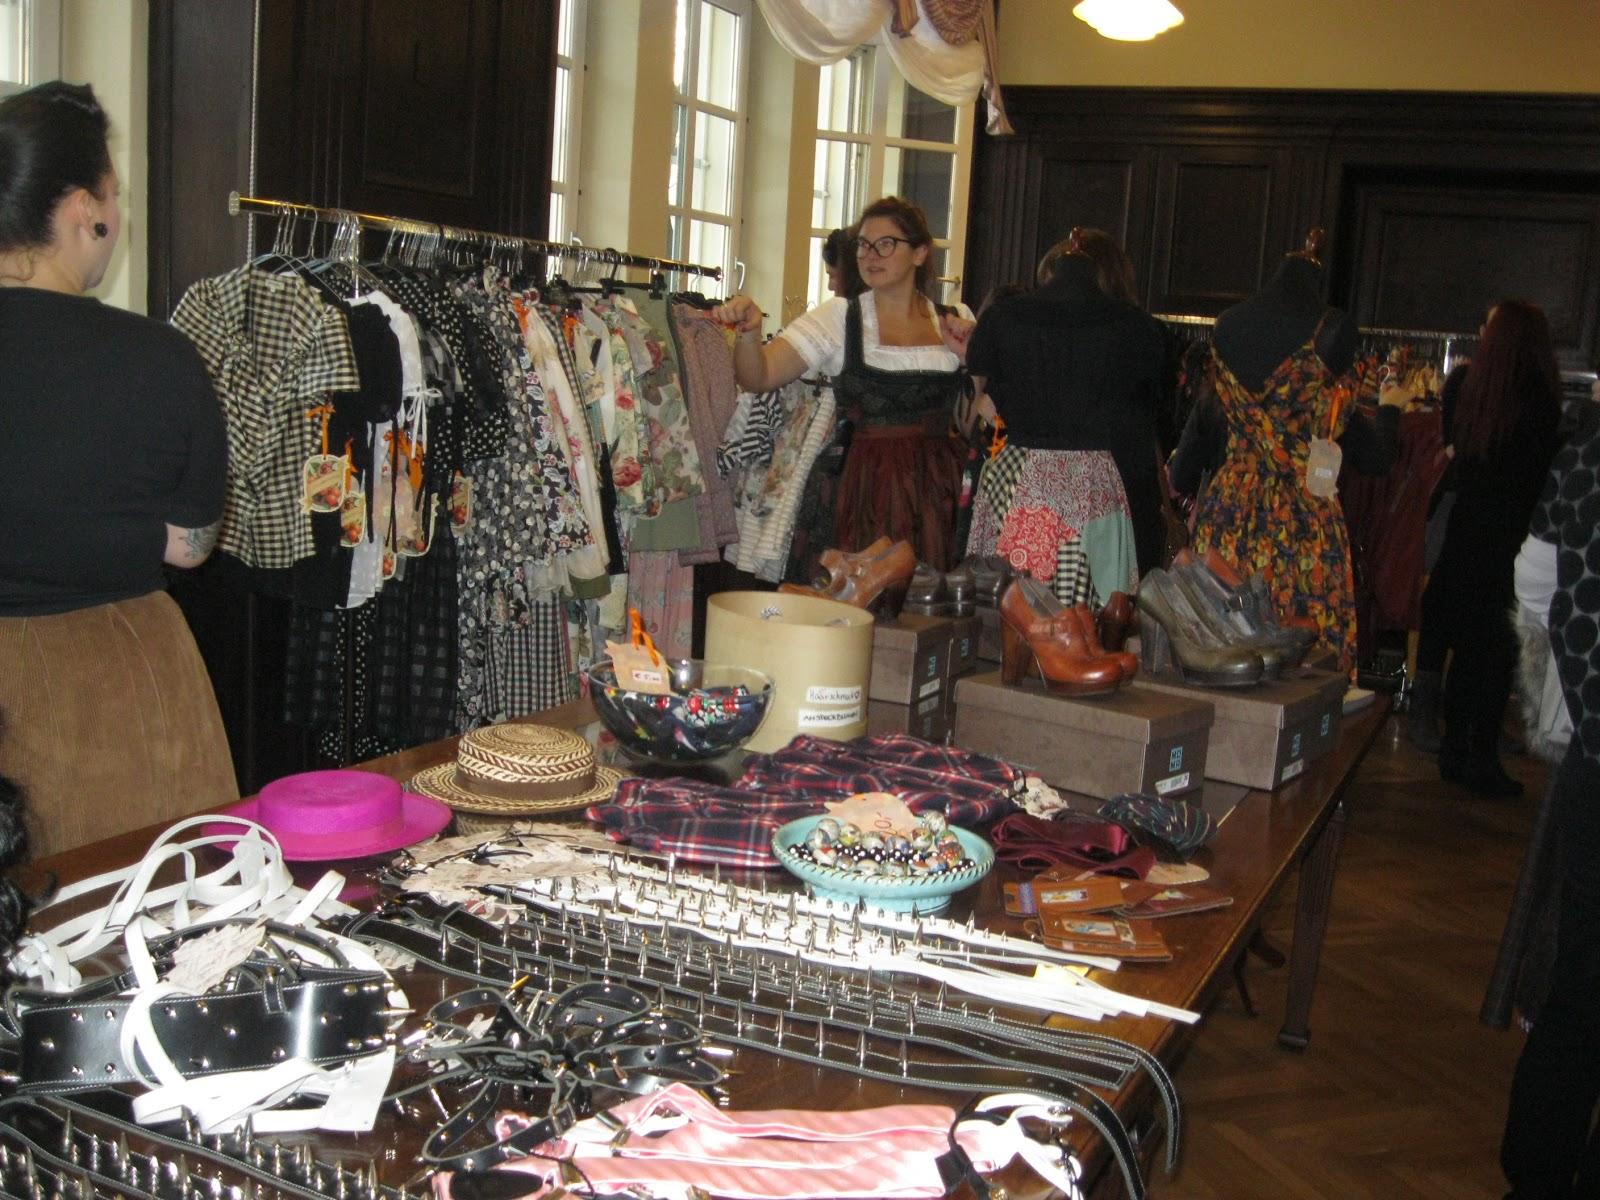 royalpinkgoth alternative fashion in vienna lena hoschek stock sale. Black Bedroom Furniture Sets. Home Design Ideas